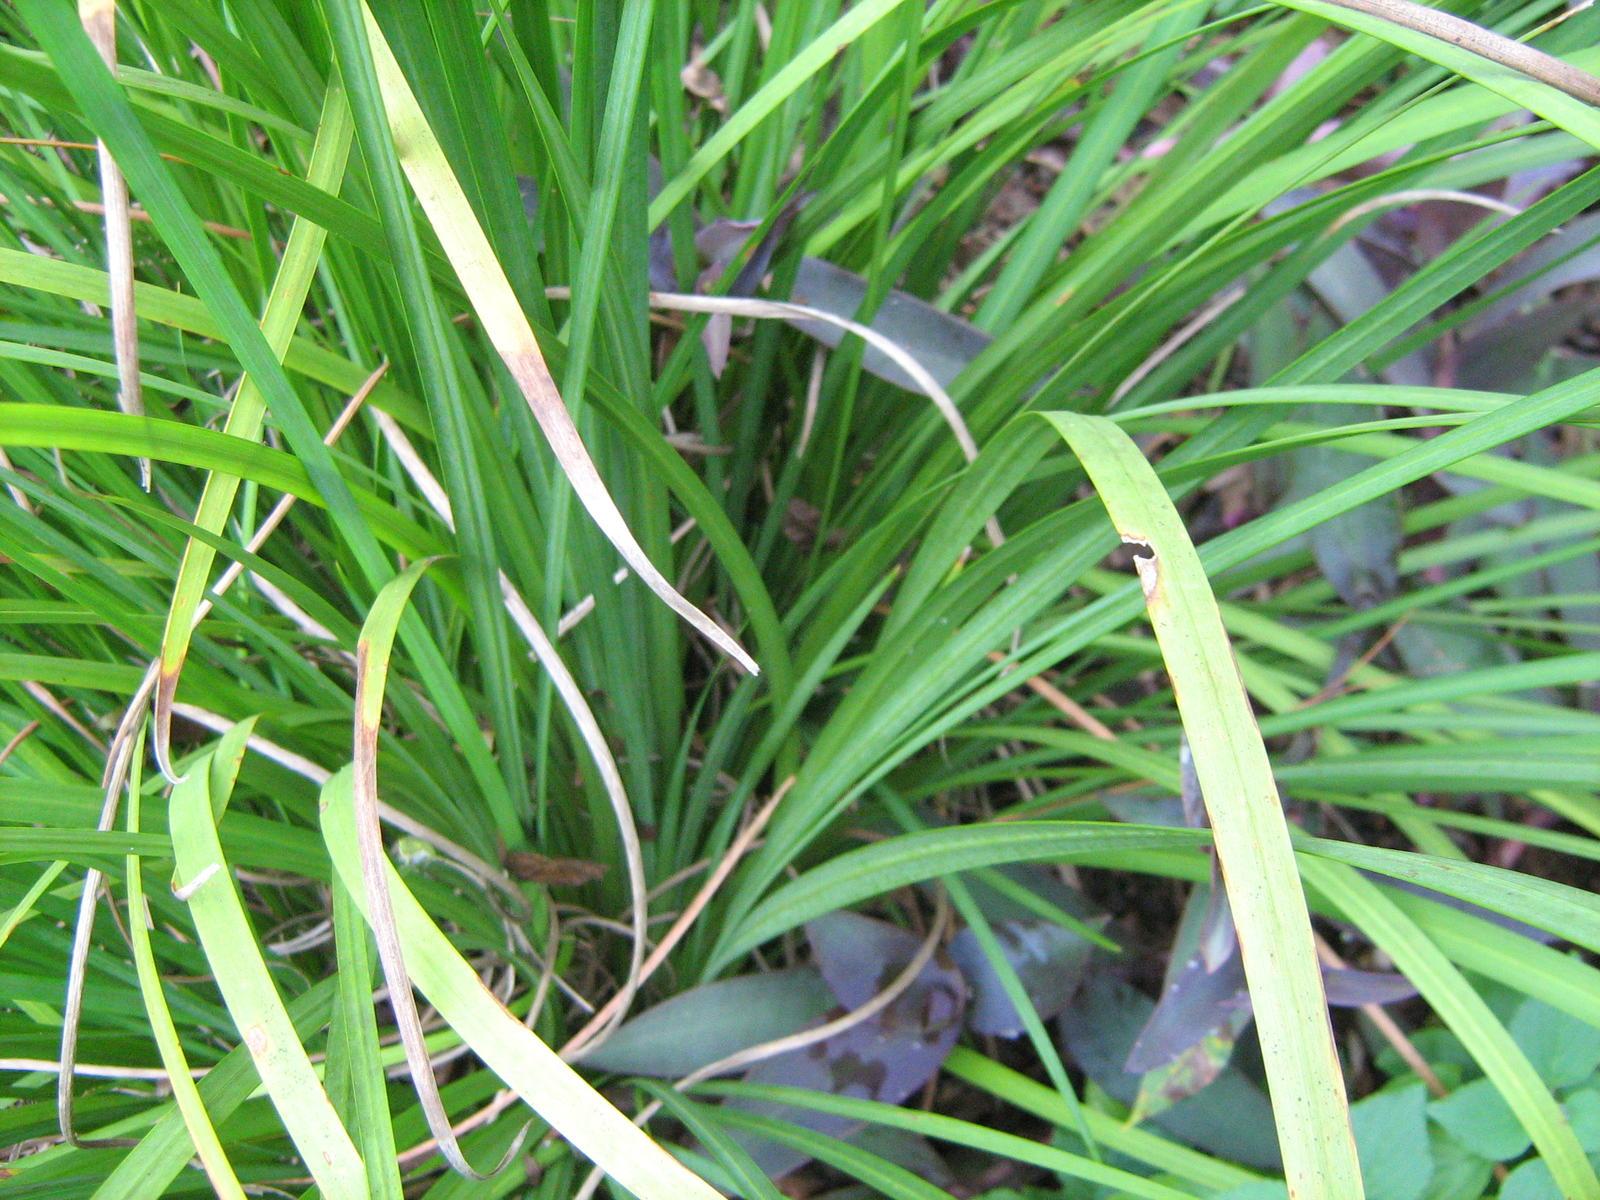 Help me identify this plant flower iris growing grass – Garden Plants Identification